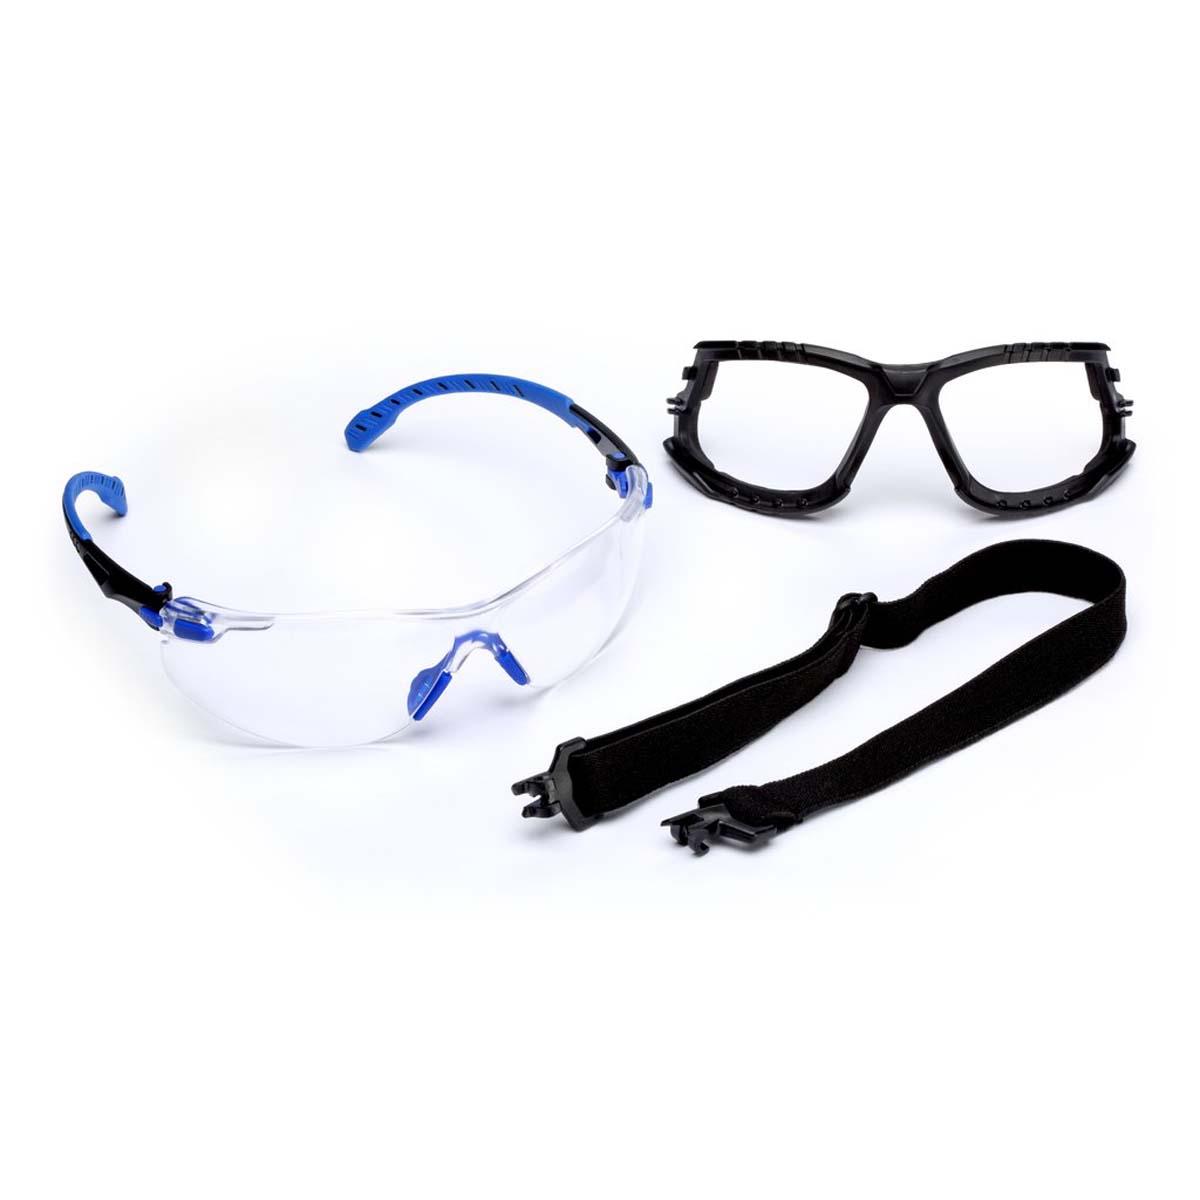 "3Mâ""¢ Solusâ""¢ 1000-Series S1101SGAF-KT, Kit, Foam, Strap, Black/Blue, Clear Scotchgardâ""¢ Anti-fog Lens"